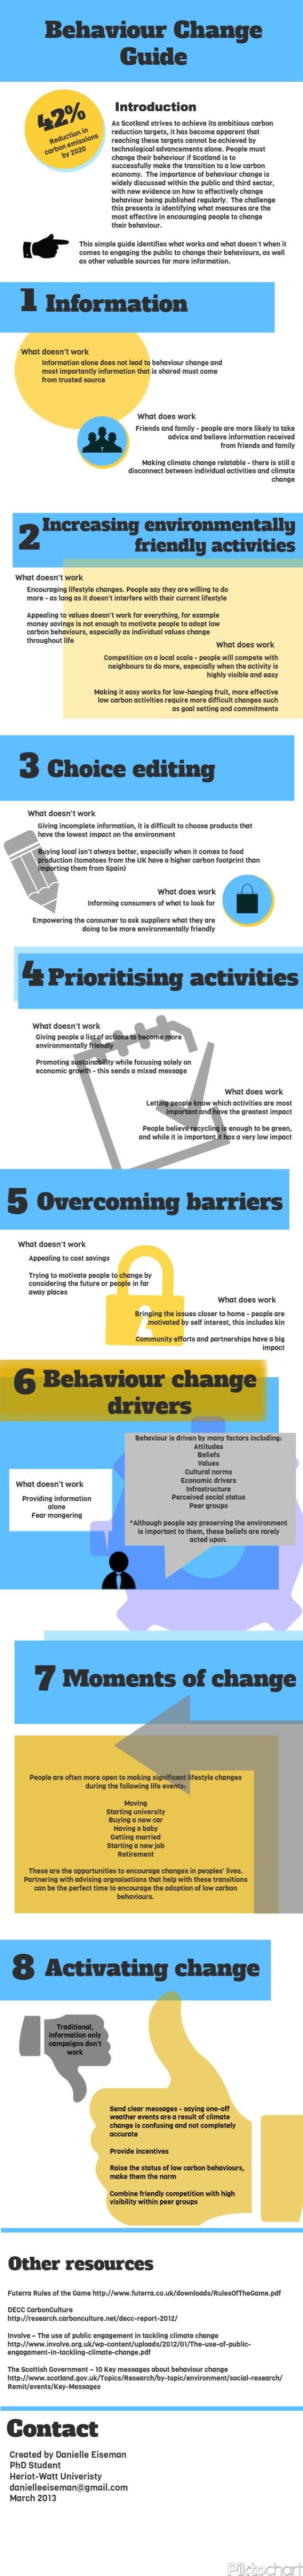 Behaviour change guide march 2013